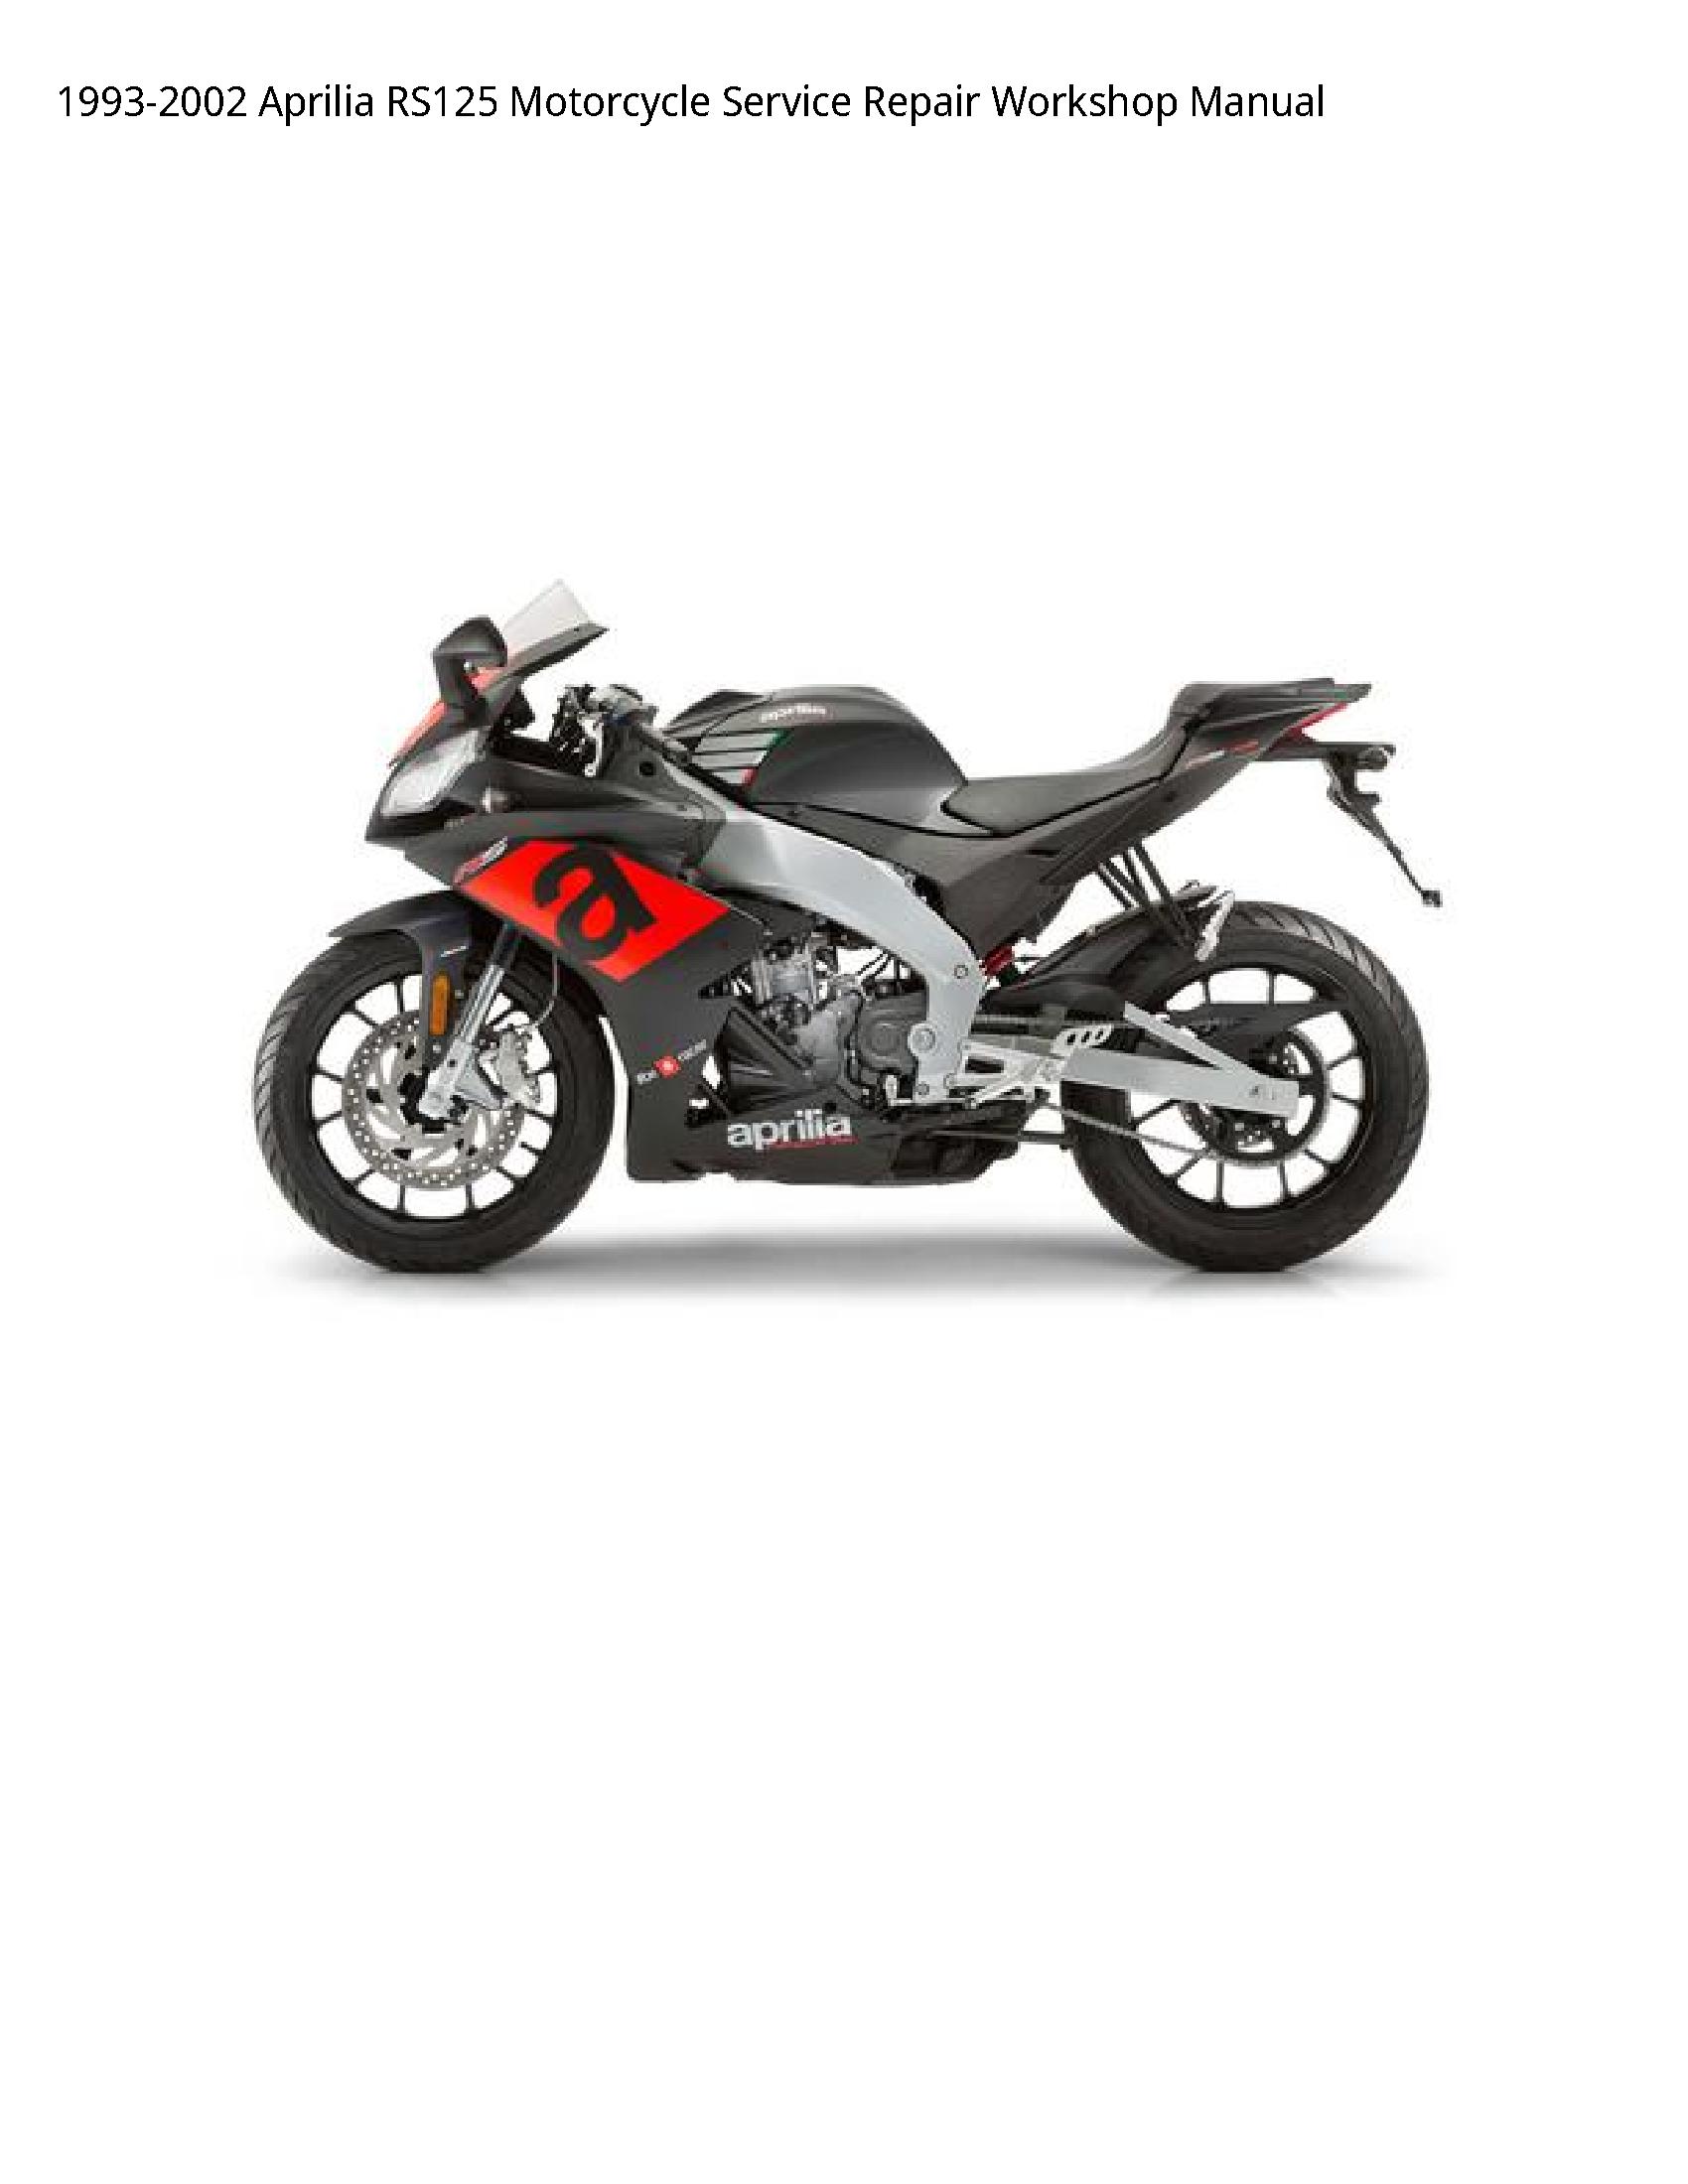 Aprilia RS125 Motorcycle manual